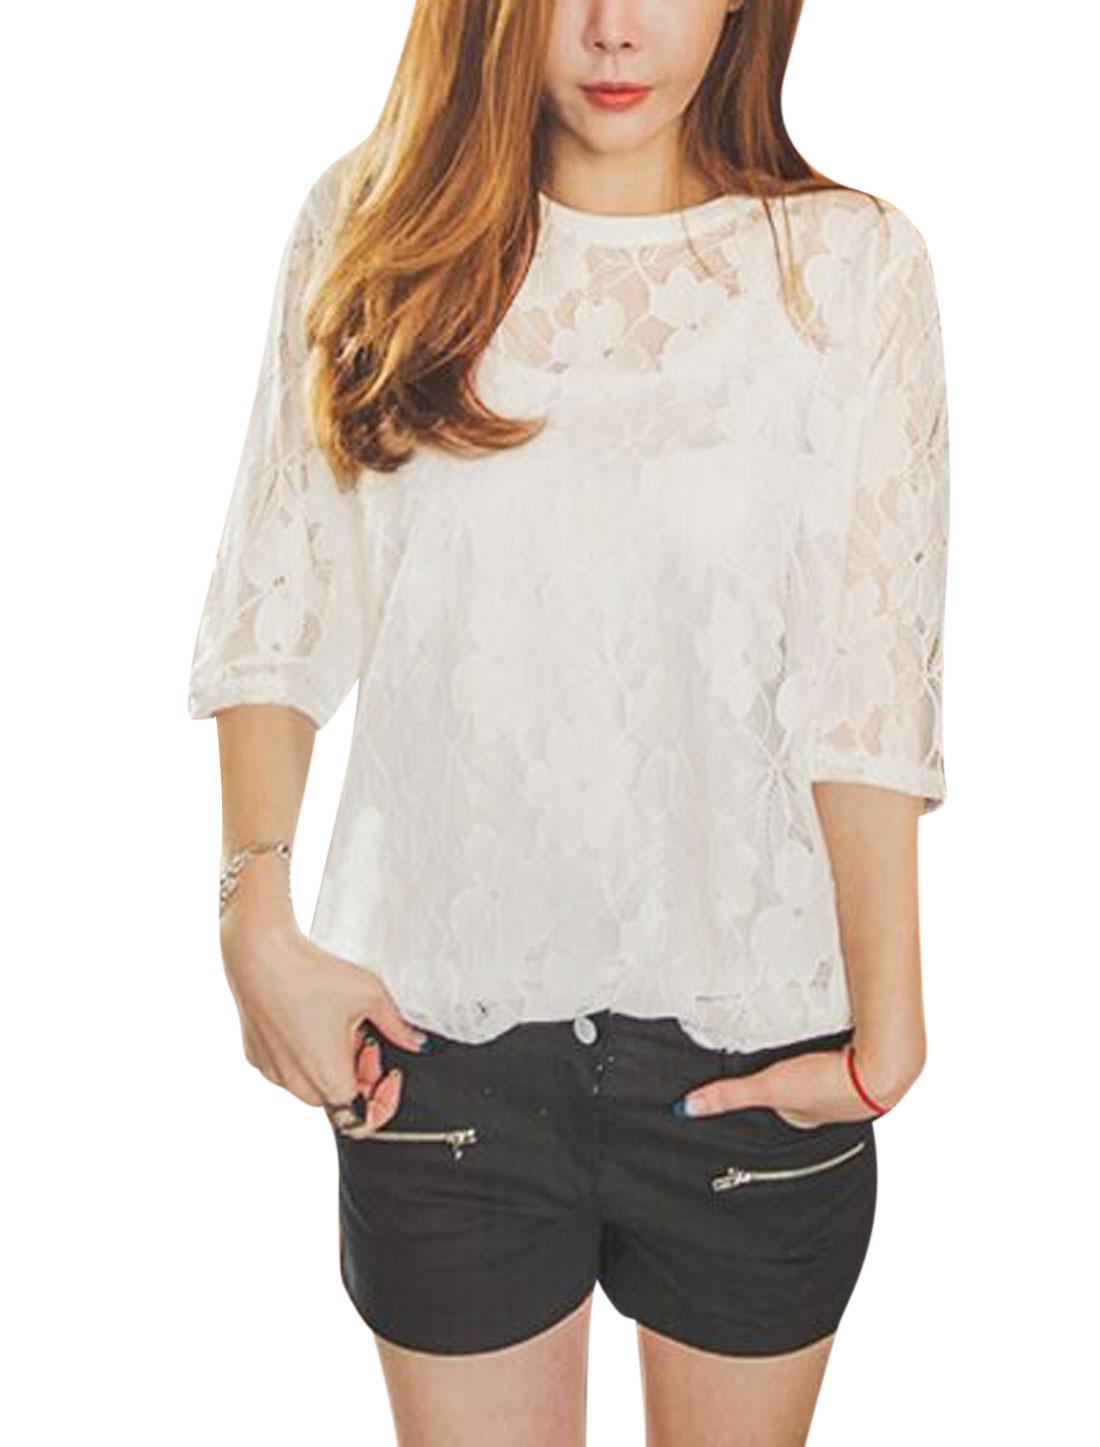 Woman U Neck Cami w Floral Design 3/4 Sleeves Lace Blouse White XS